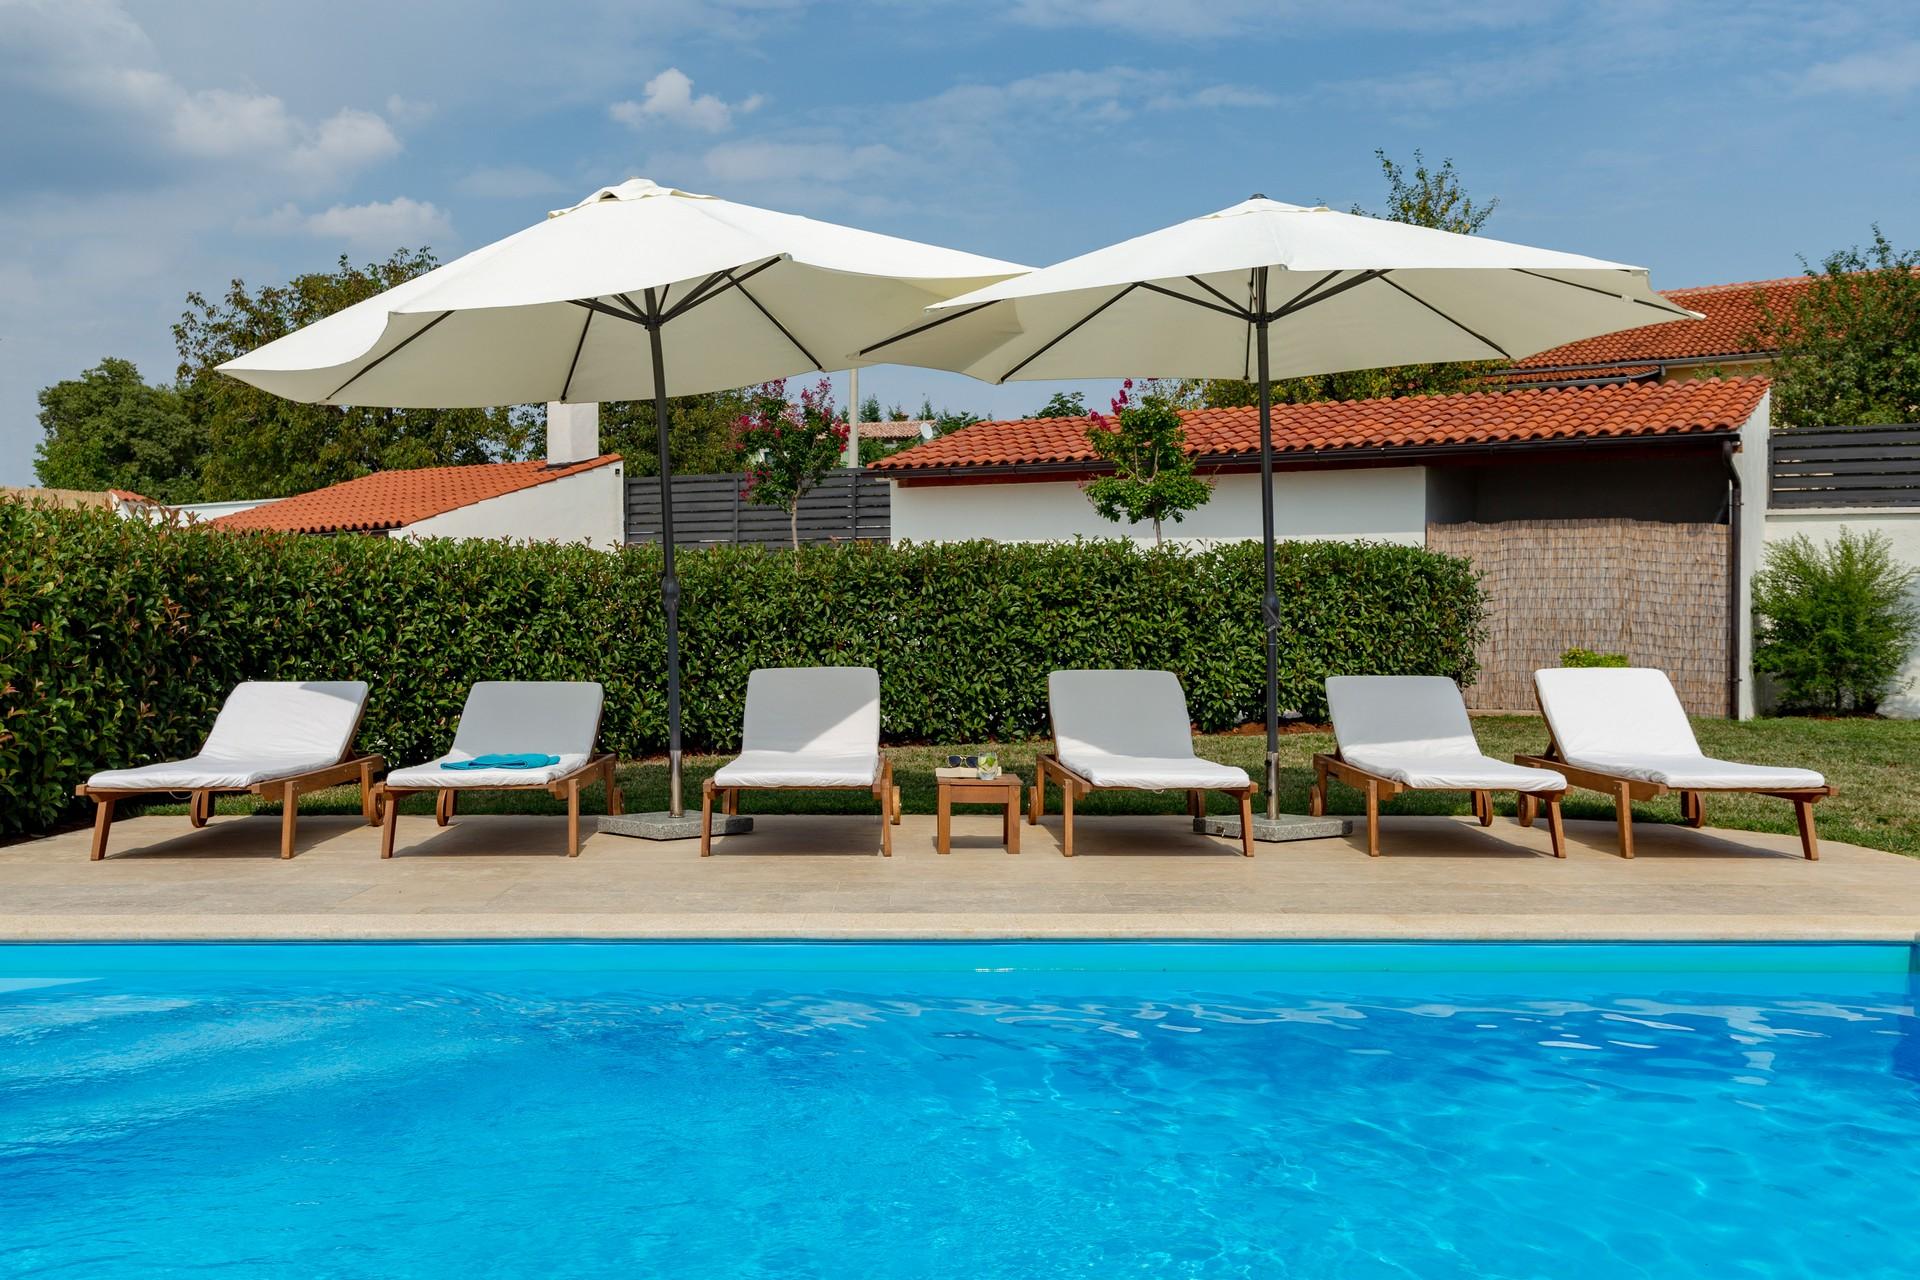 villa deal outdoors (7)